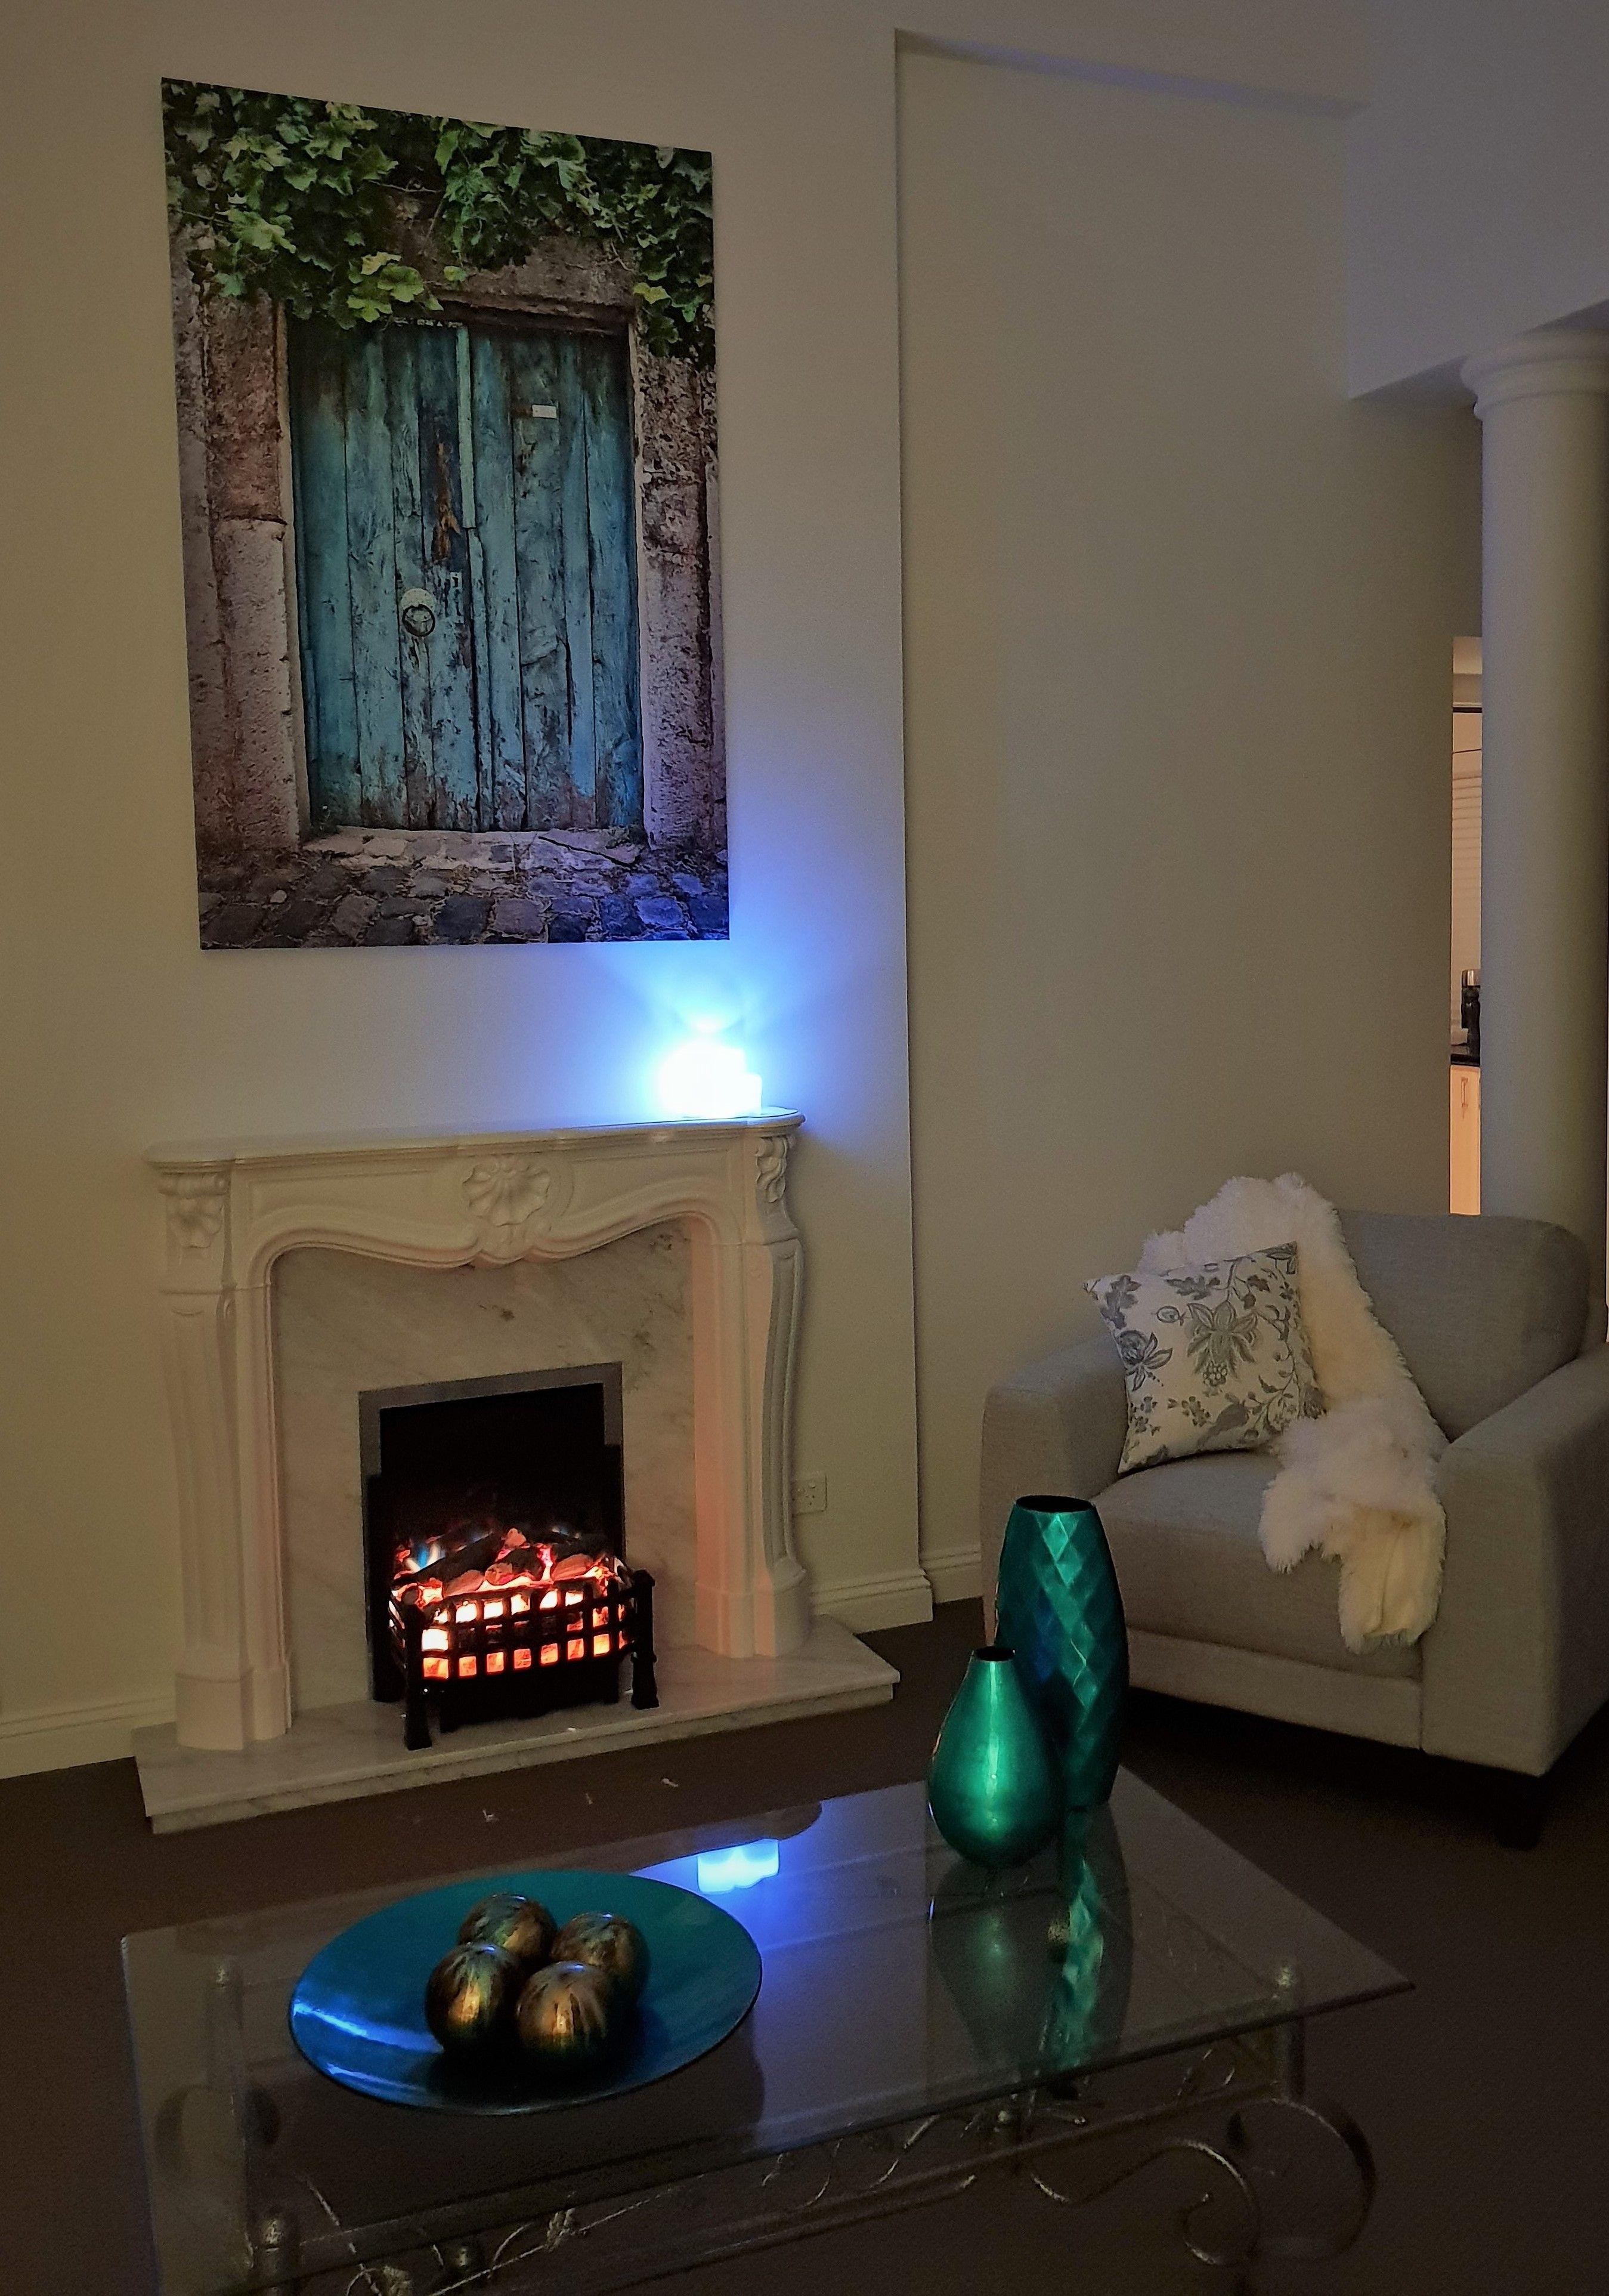 lounge furniture design interior decor furnishings decorate